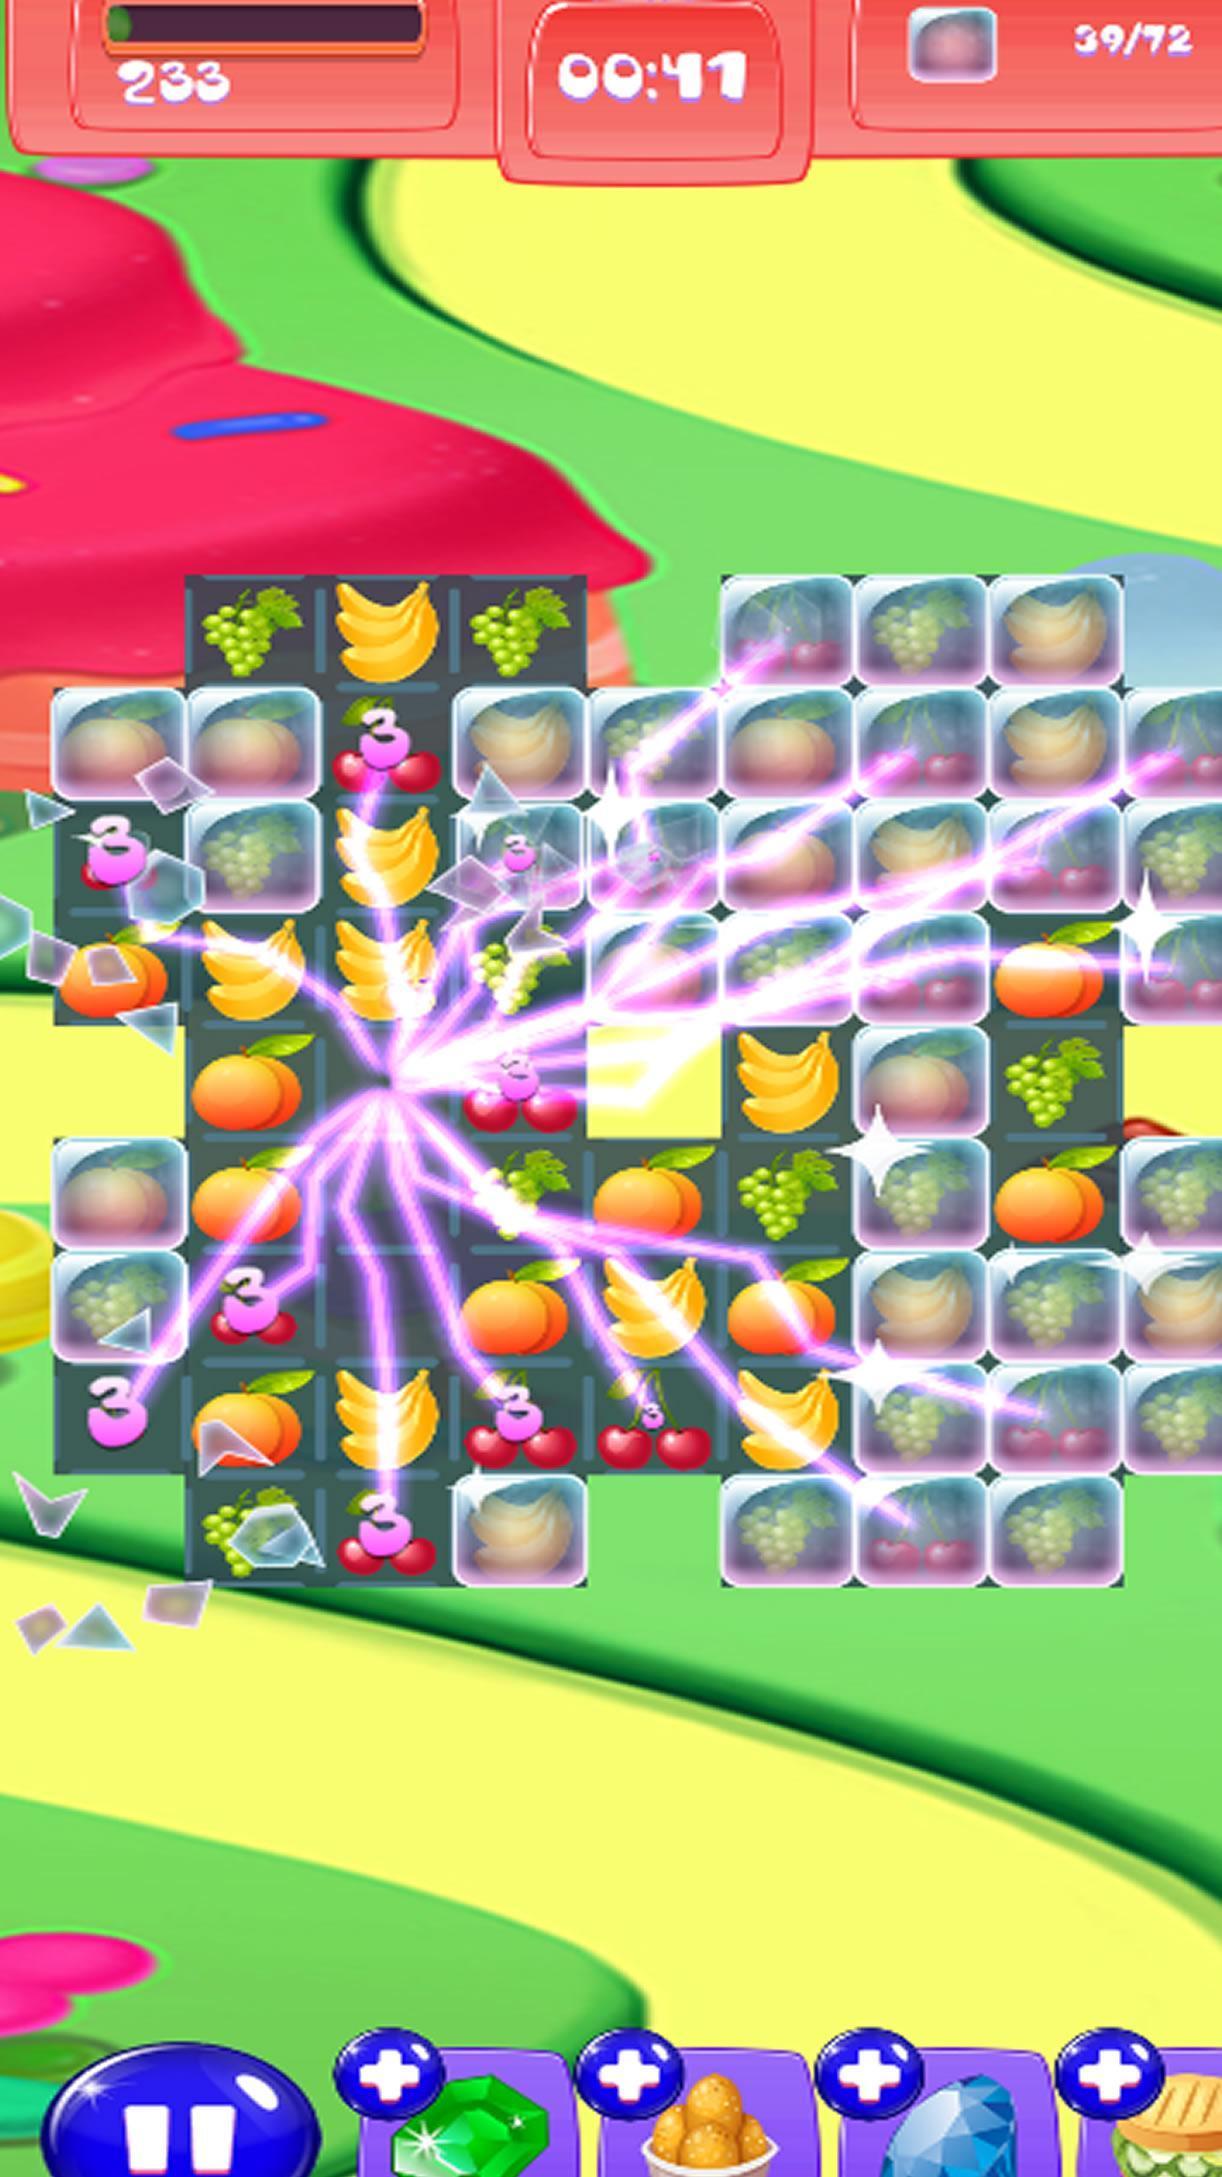 Fruit Splash Match Swipe 1.0 Screenshot 3